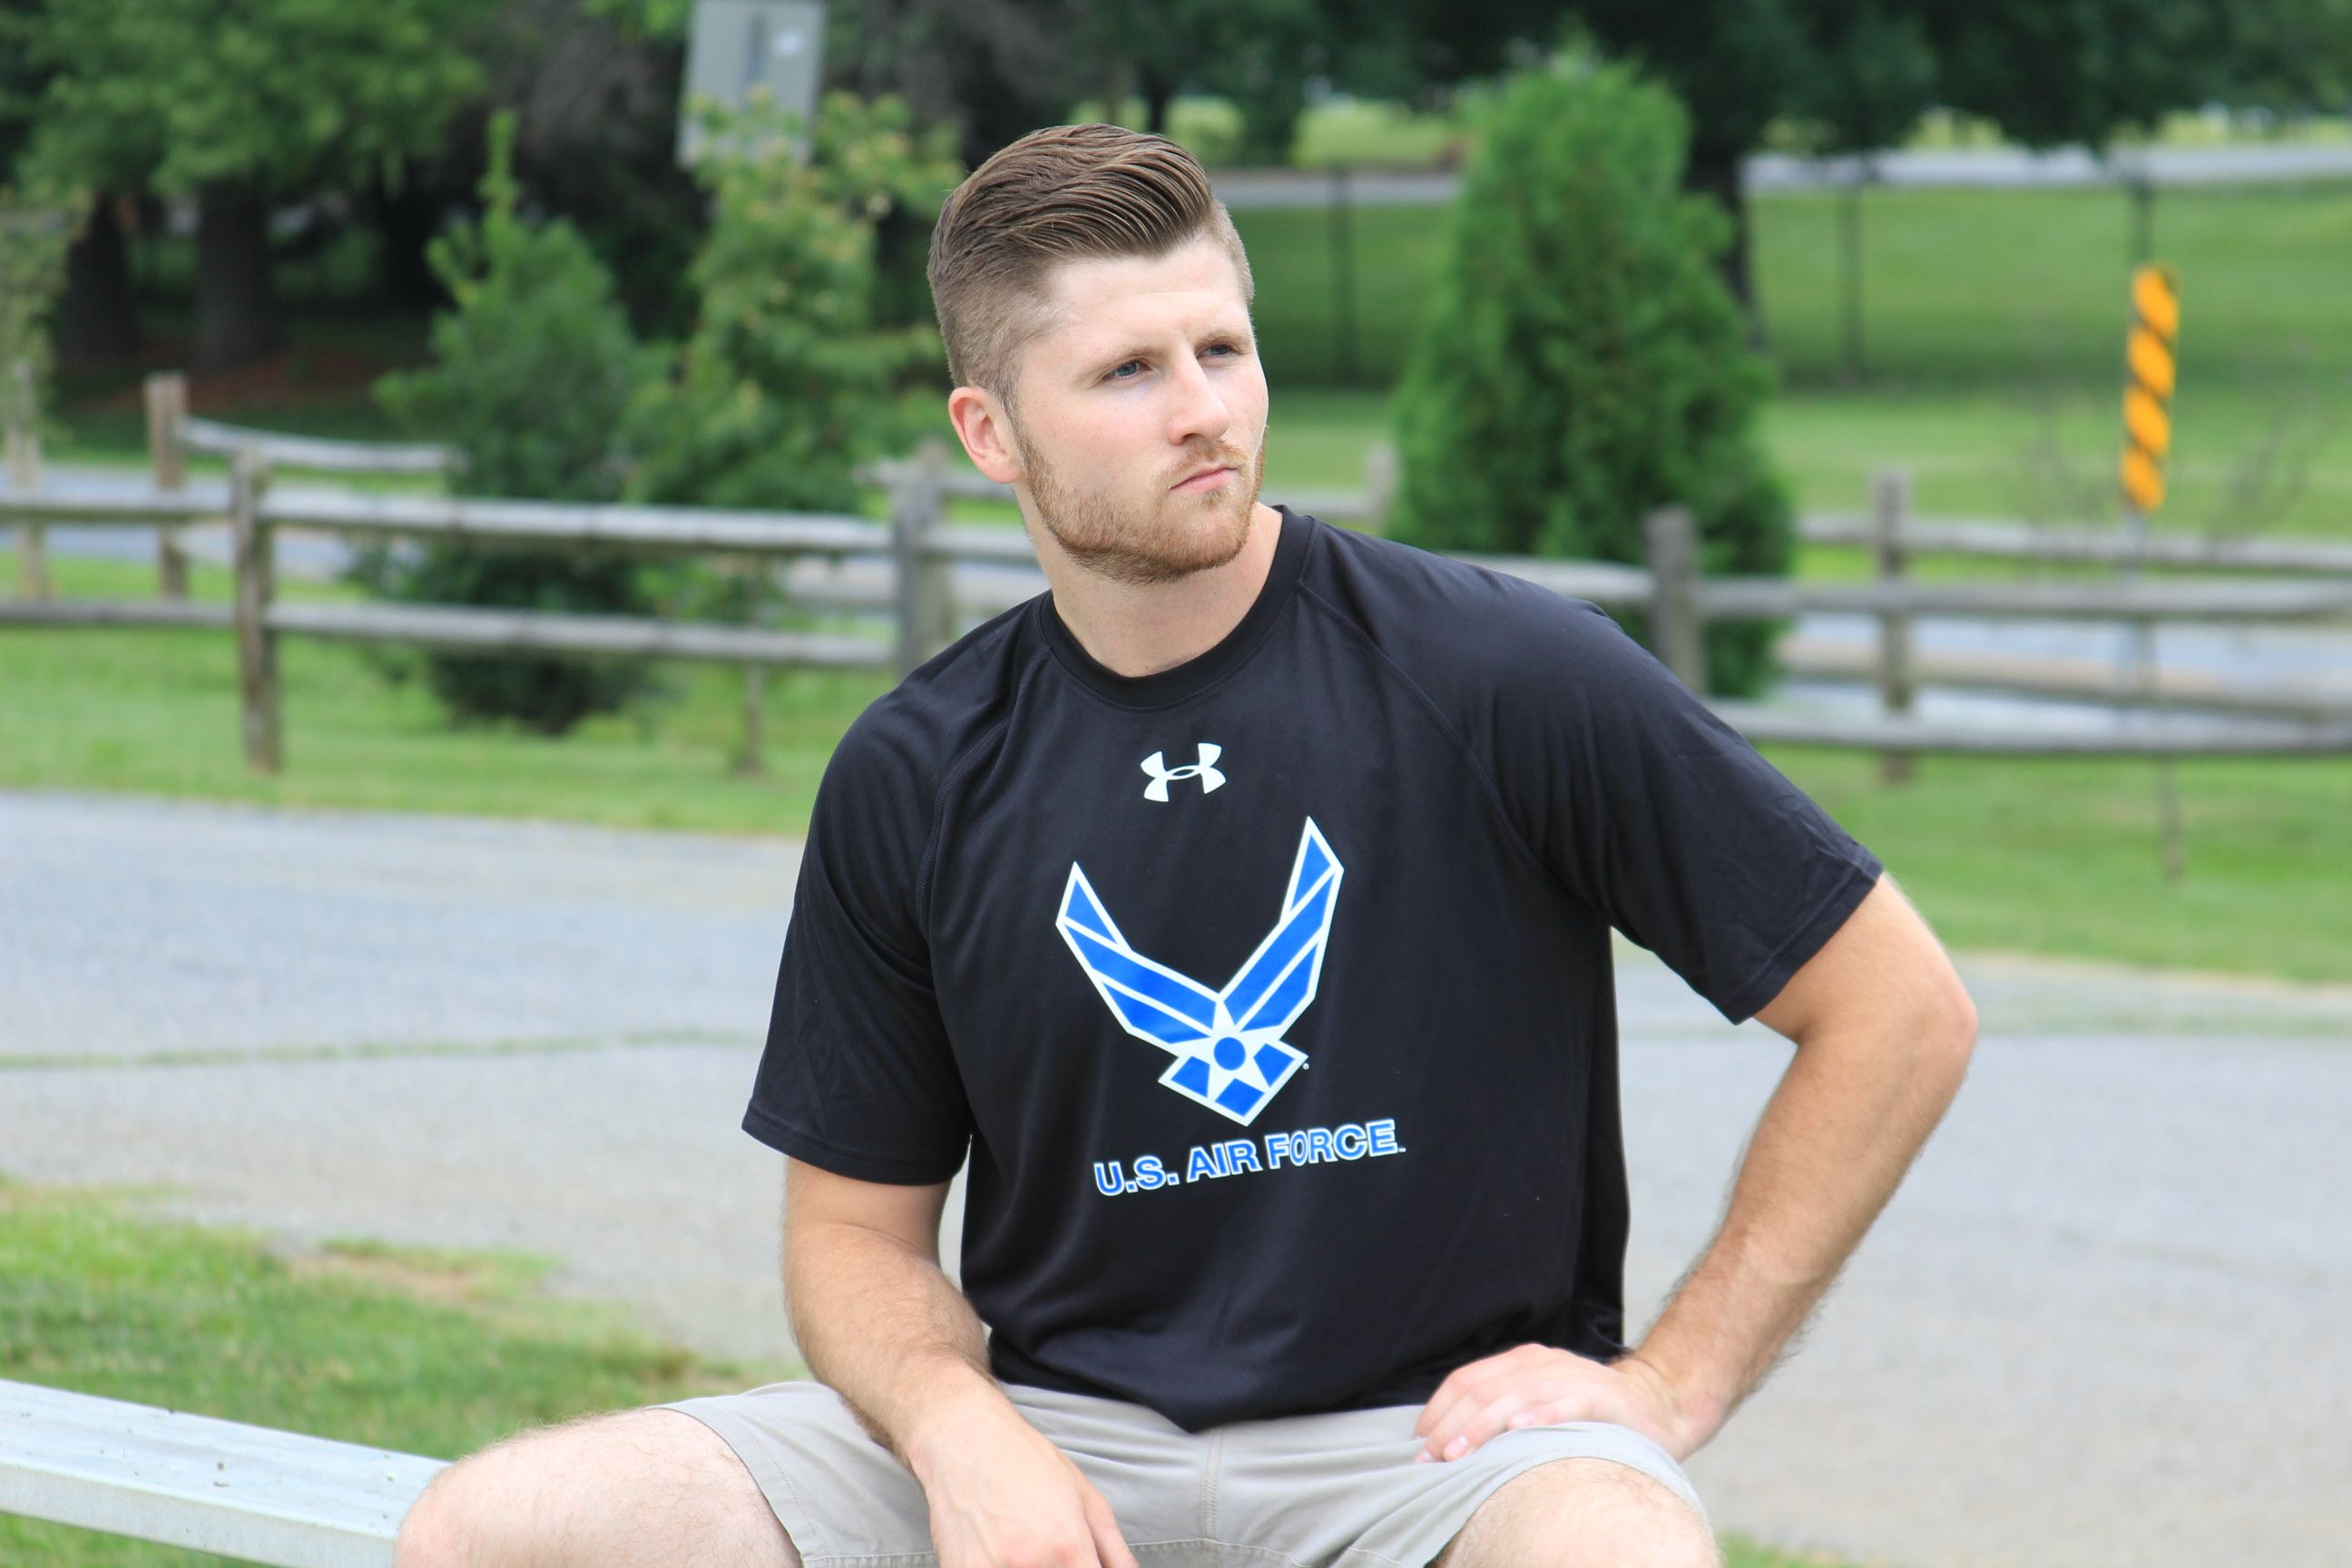 Air force wings under armour tech tshirt (black) Tech t